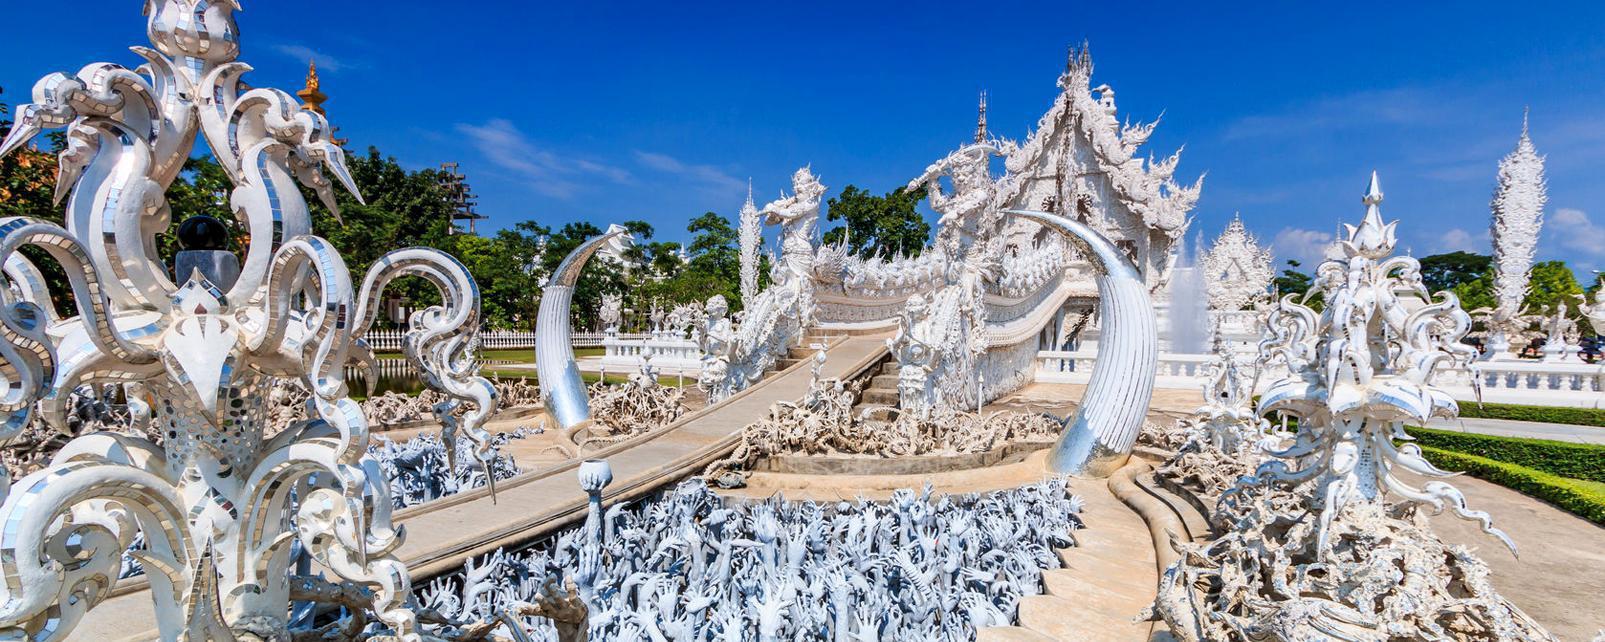 Wat Rong Khun o Templo Blanco